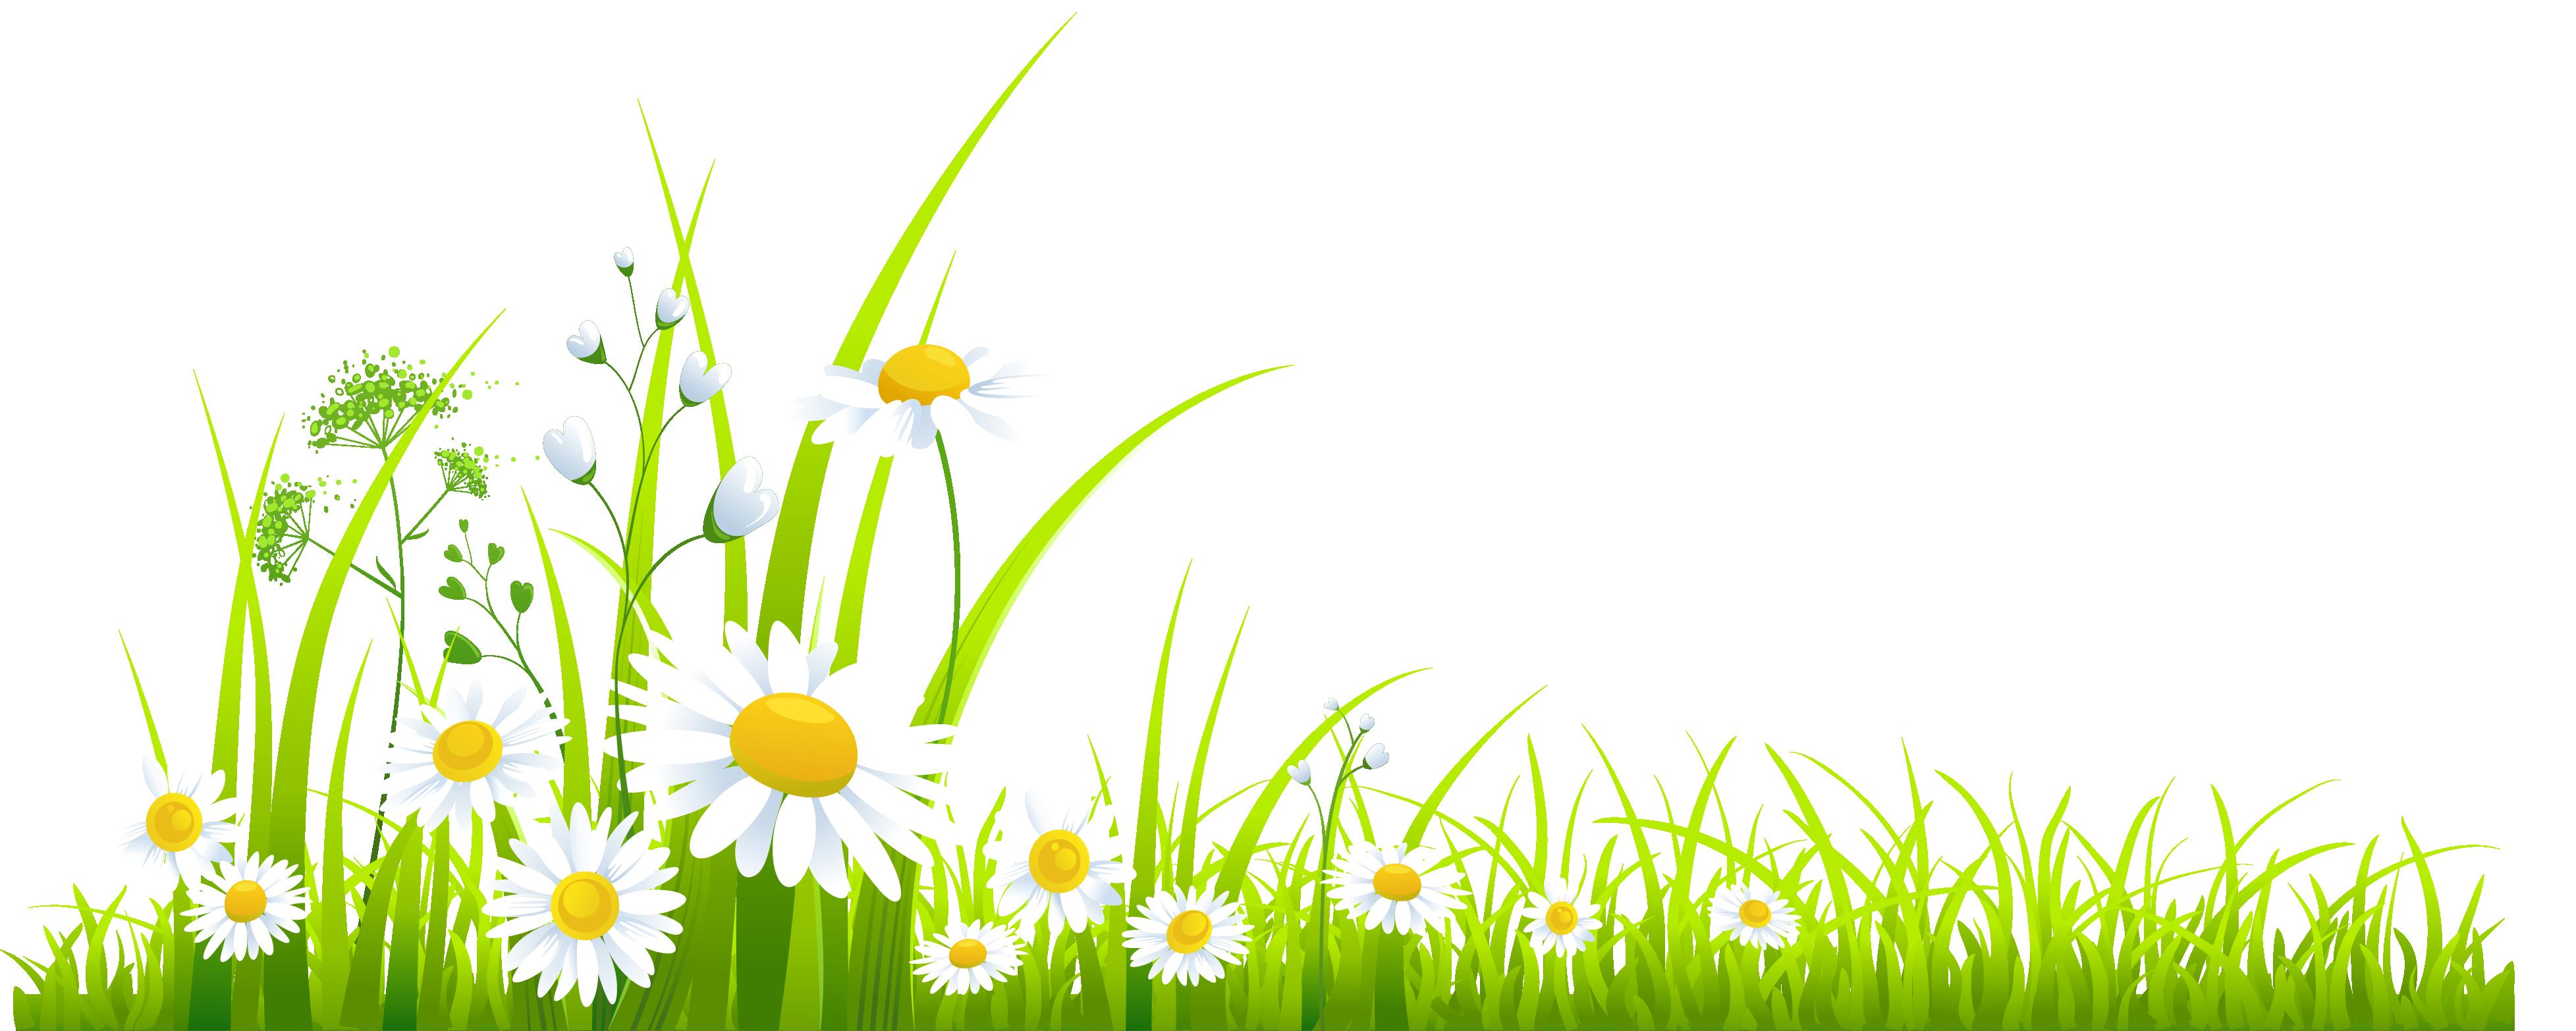 Grass sun clipart royalty free library Grass Clipart. Hills Clip Art Grass Clipart - Deltasport.co royalty free library